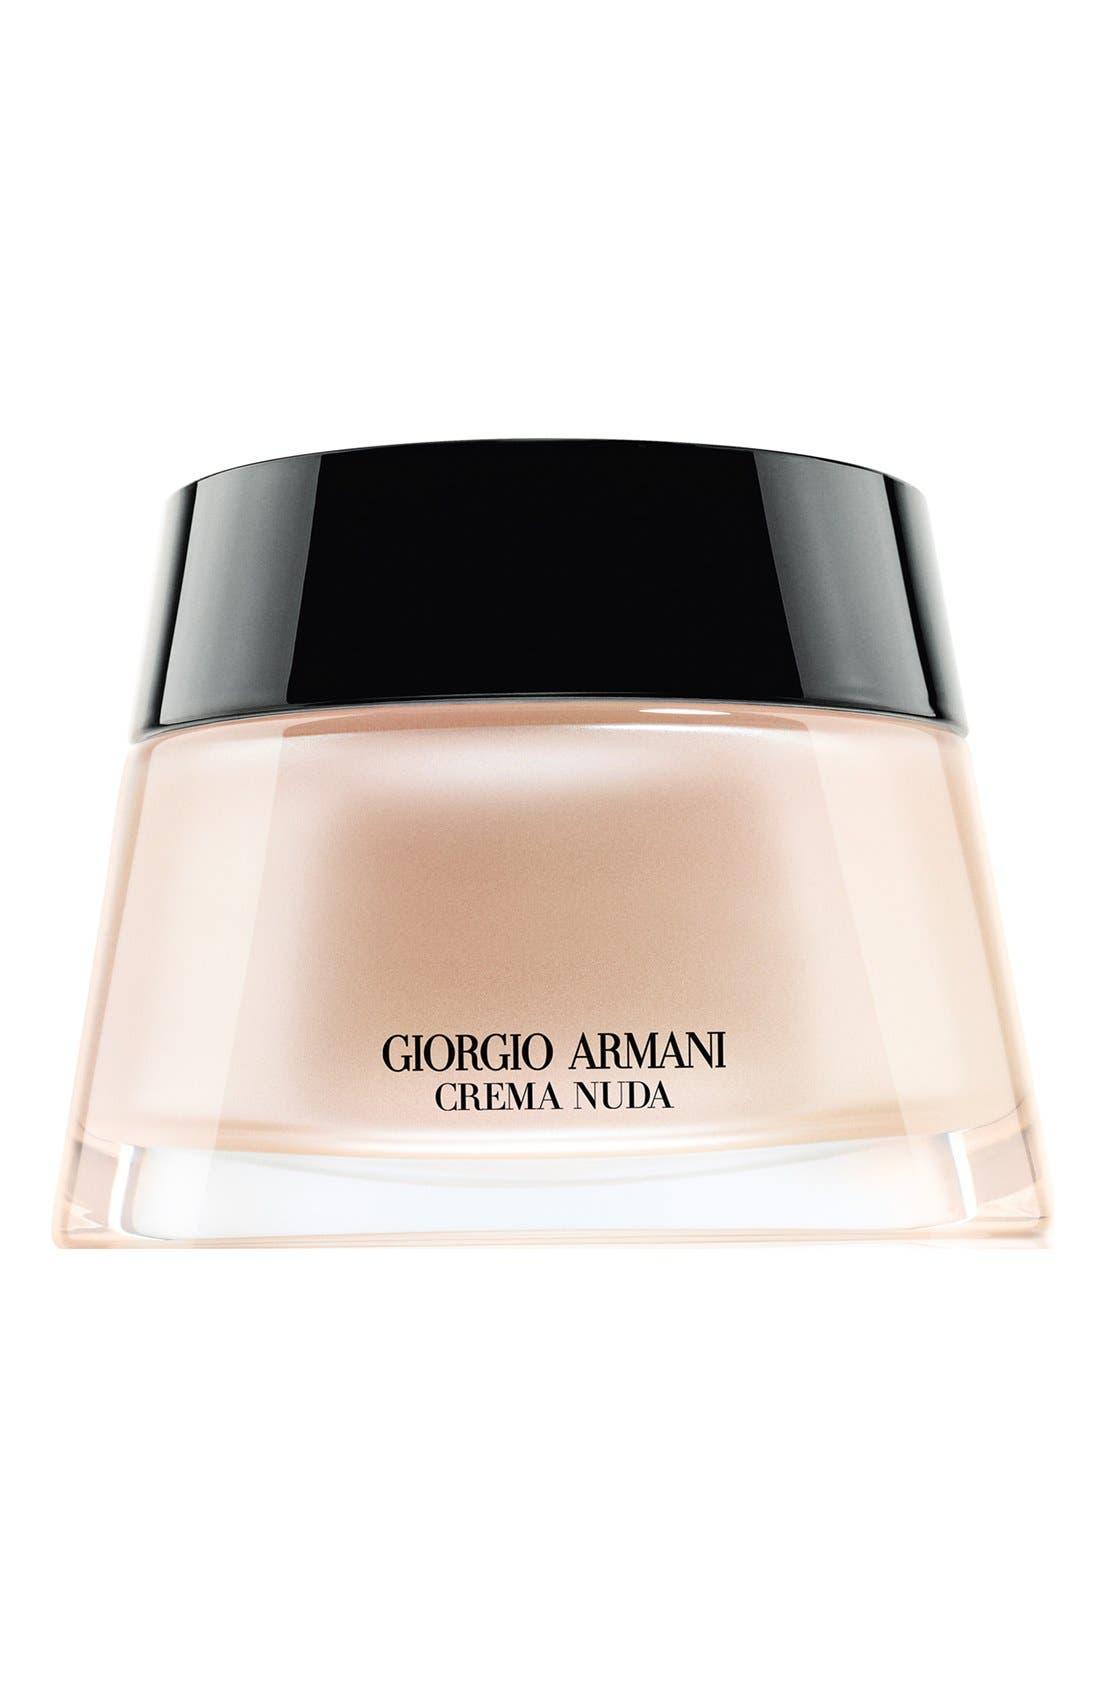 GIORGIO ARMANI, Crema Nuda Tinted Cream, Main thumbnail 1, color, 01 NUDE GLOW